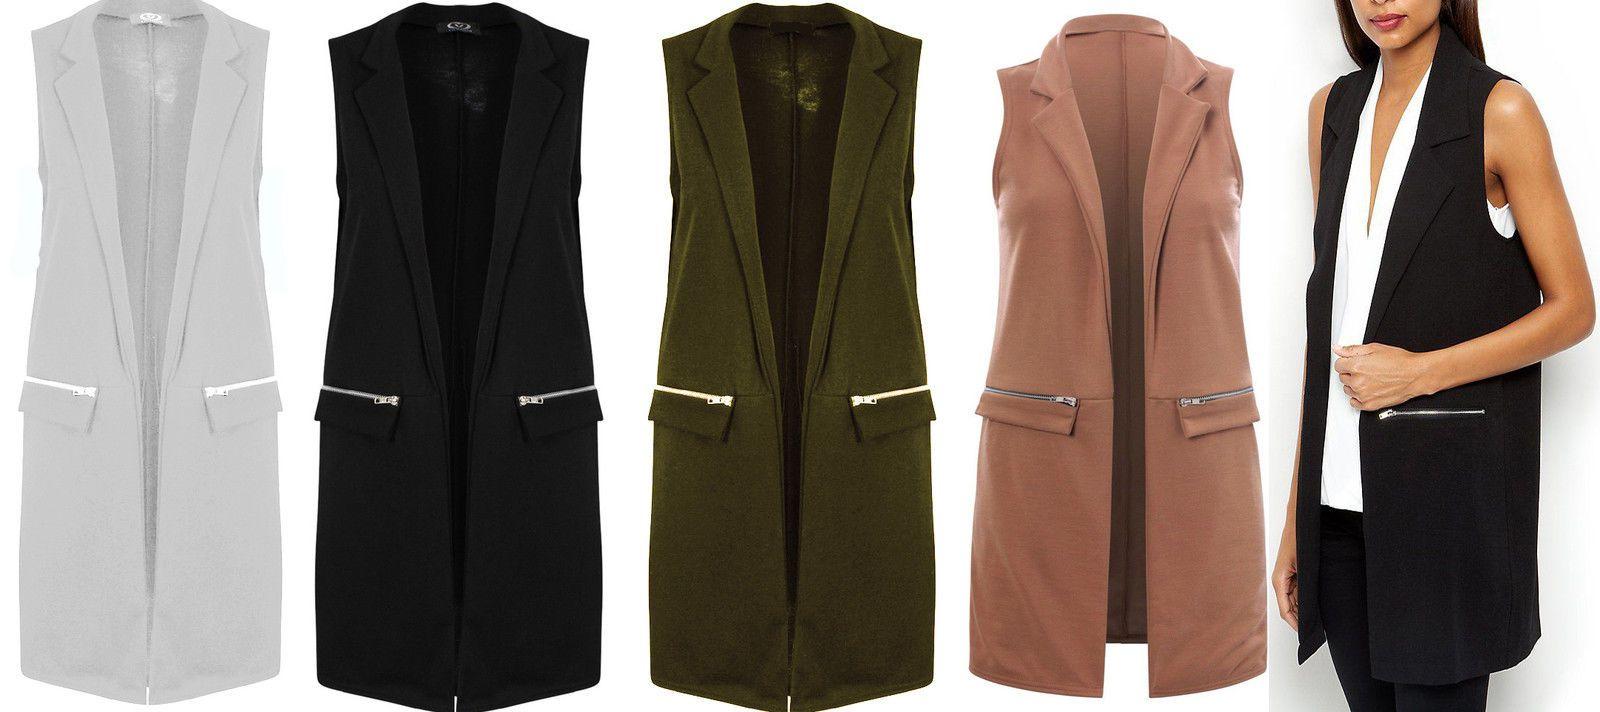 1309472941f9f New Ladies Long Duster Jacket Womens Zip Pocket Sleeveless Waistcoat Look  Top